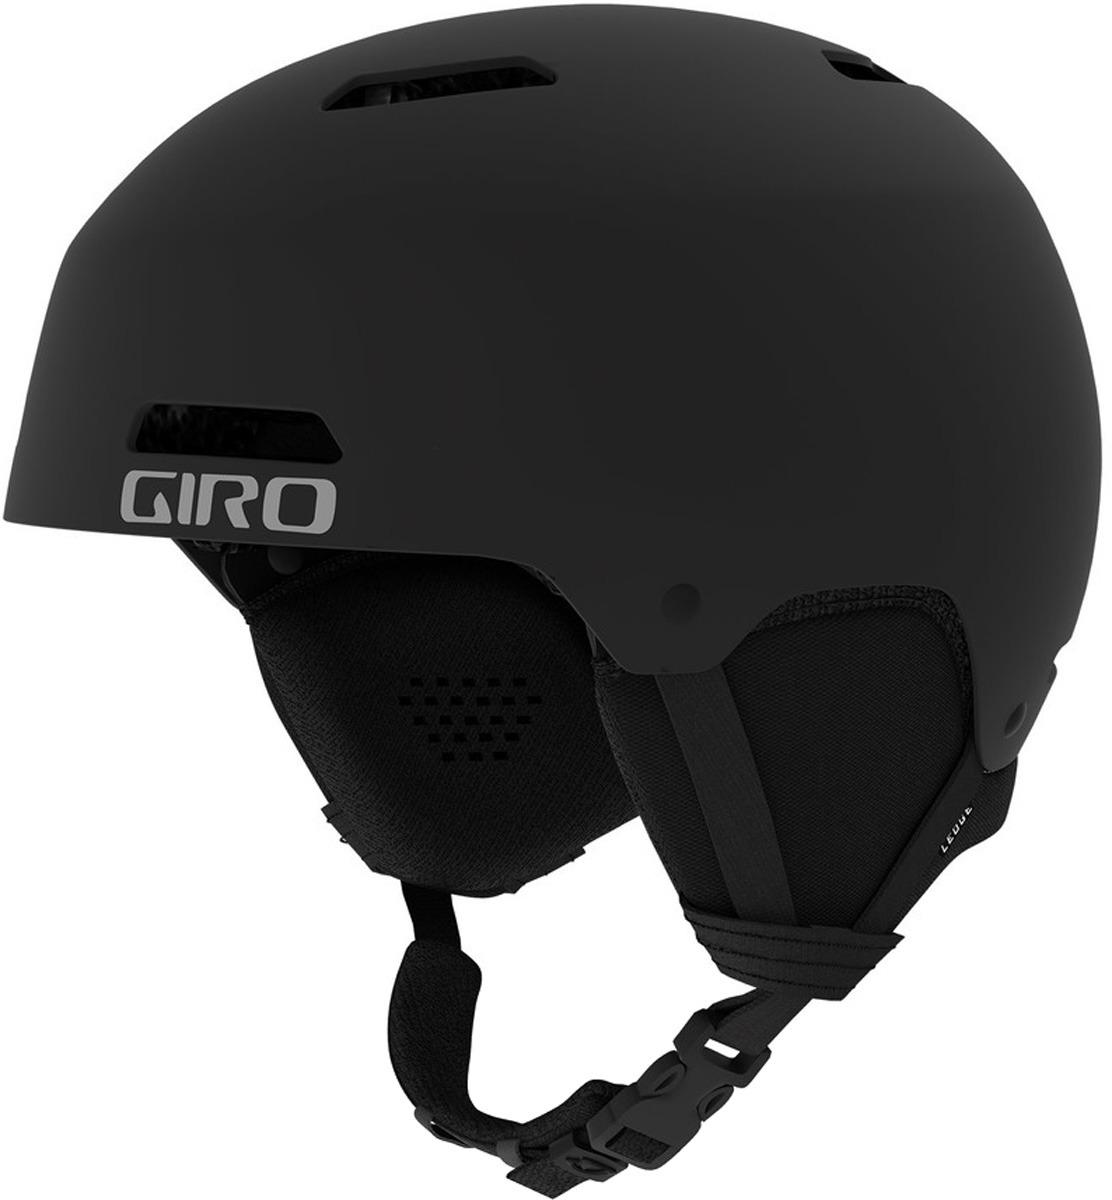 Шлем горнолыжный Giro Ledge, 7060351, черный, размер S (52-55)